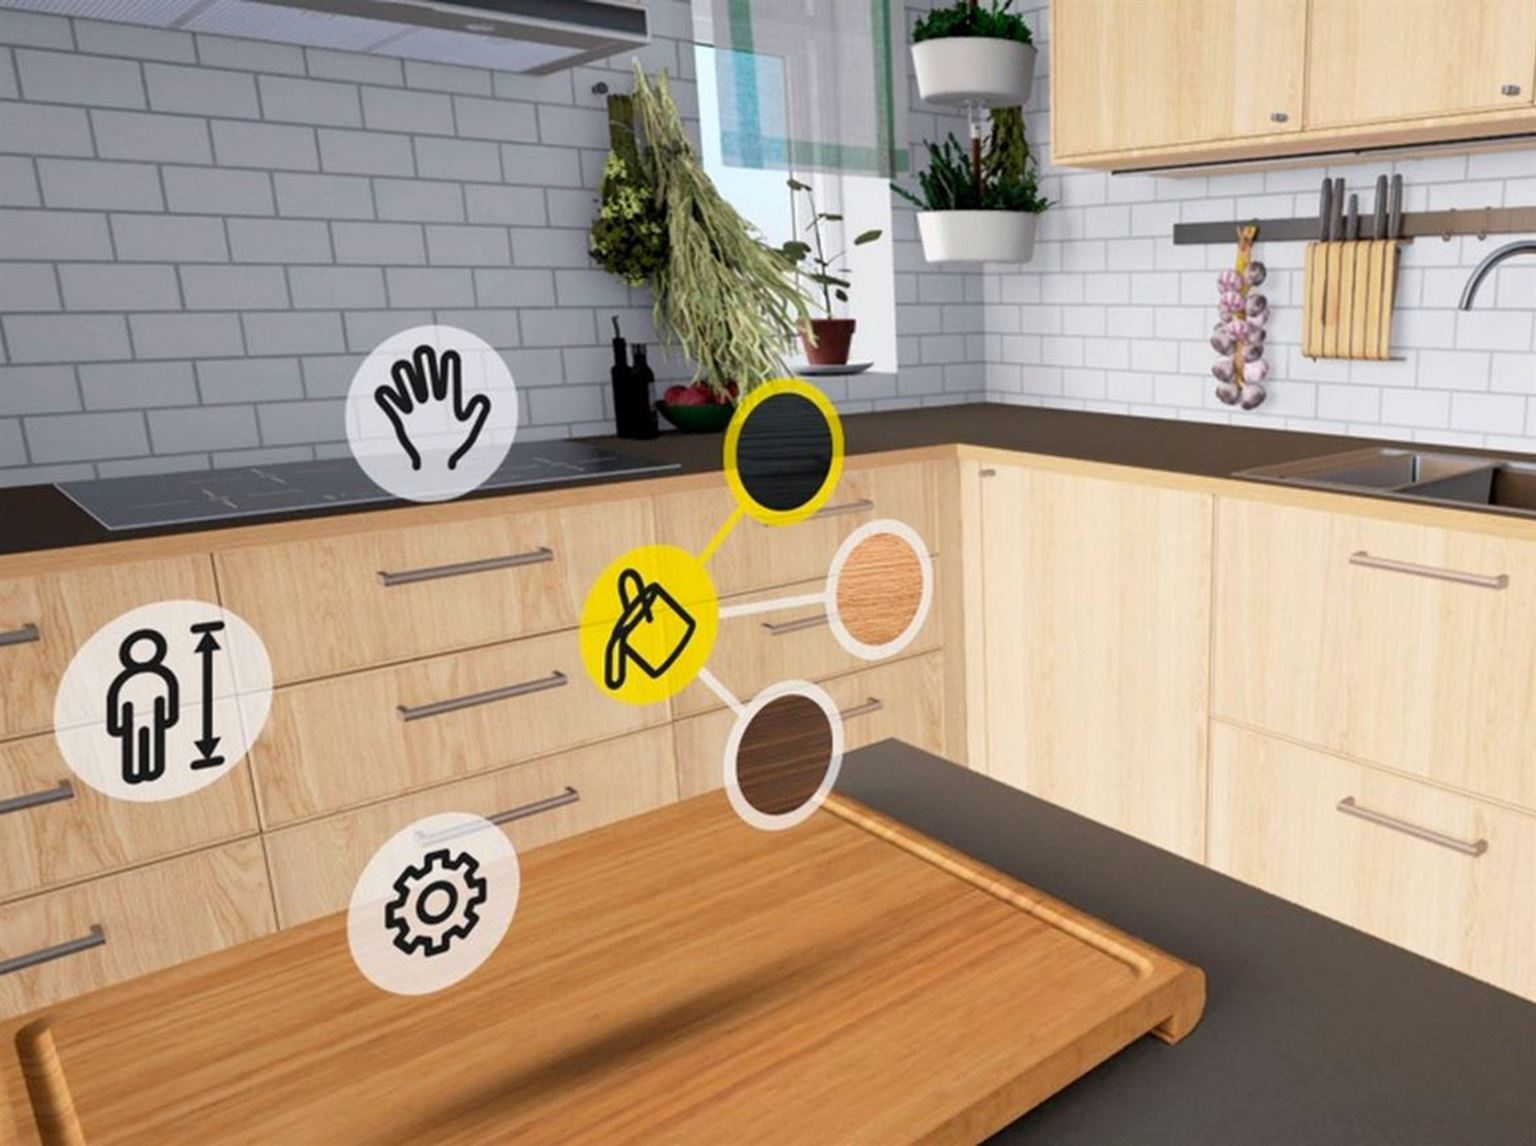 des cuisines ikea en r alit virtuelle prot gez. Black Bedroom Furniture Sets. Home Design Ideas